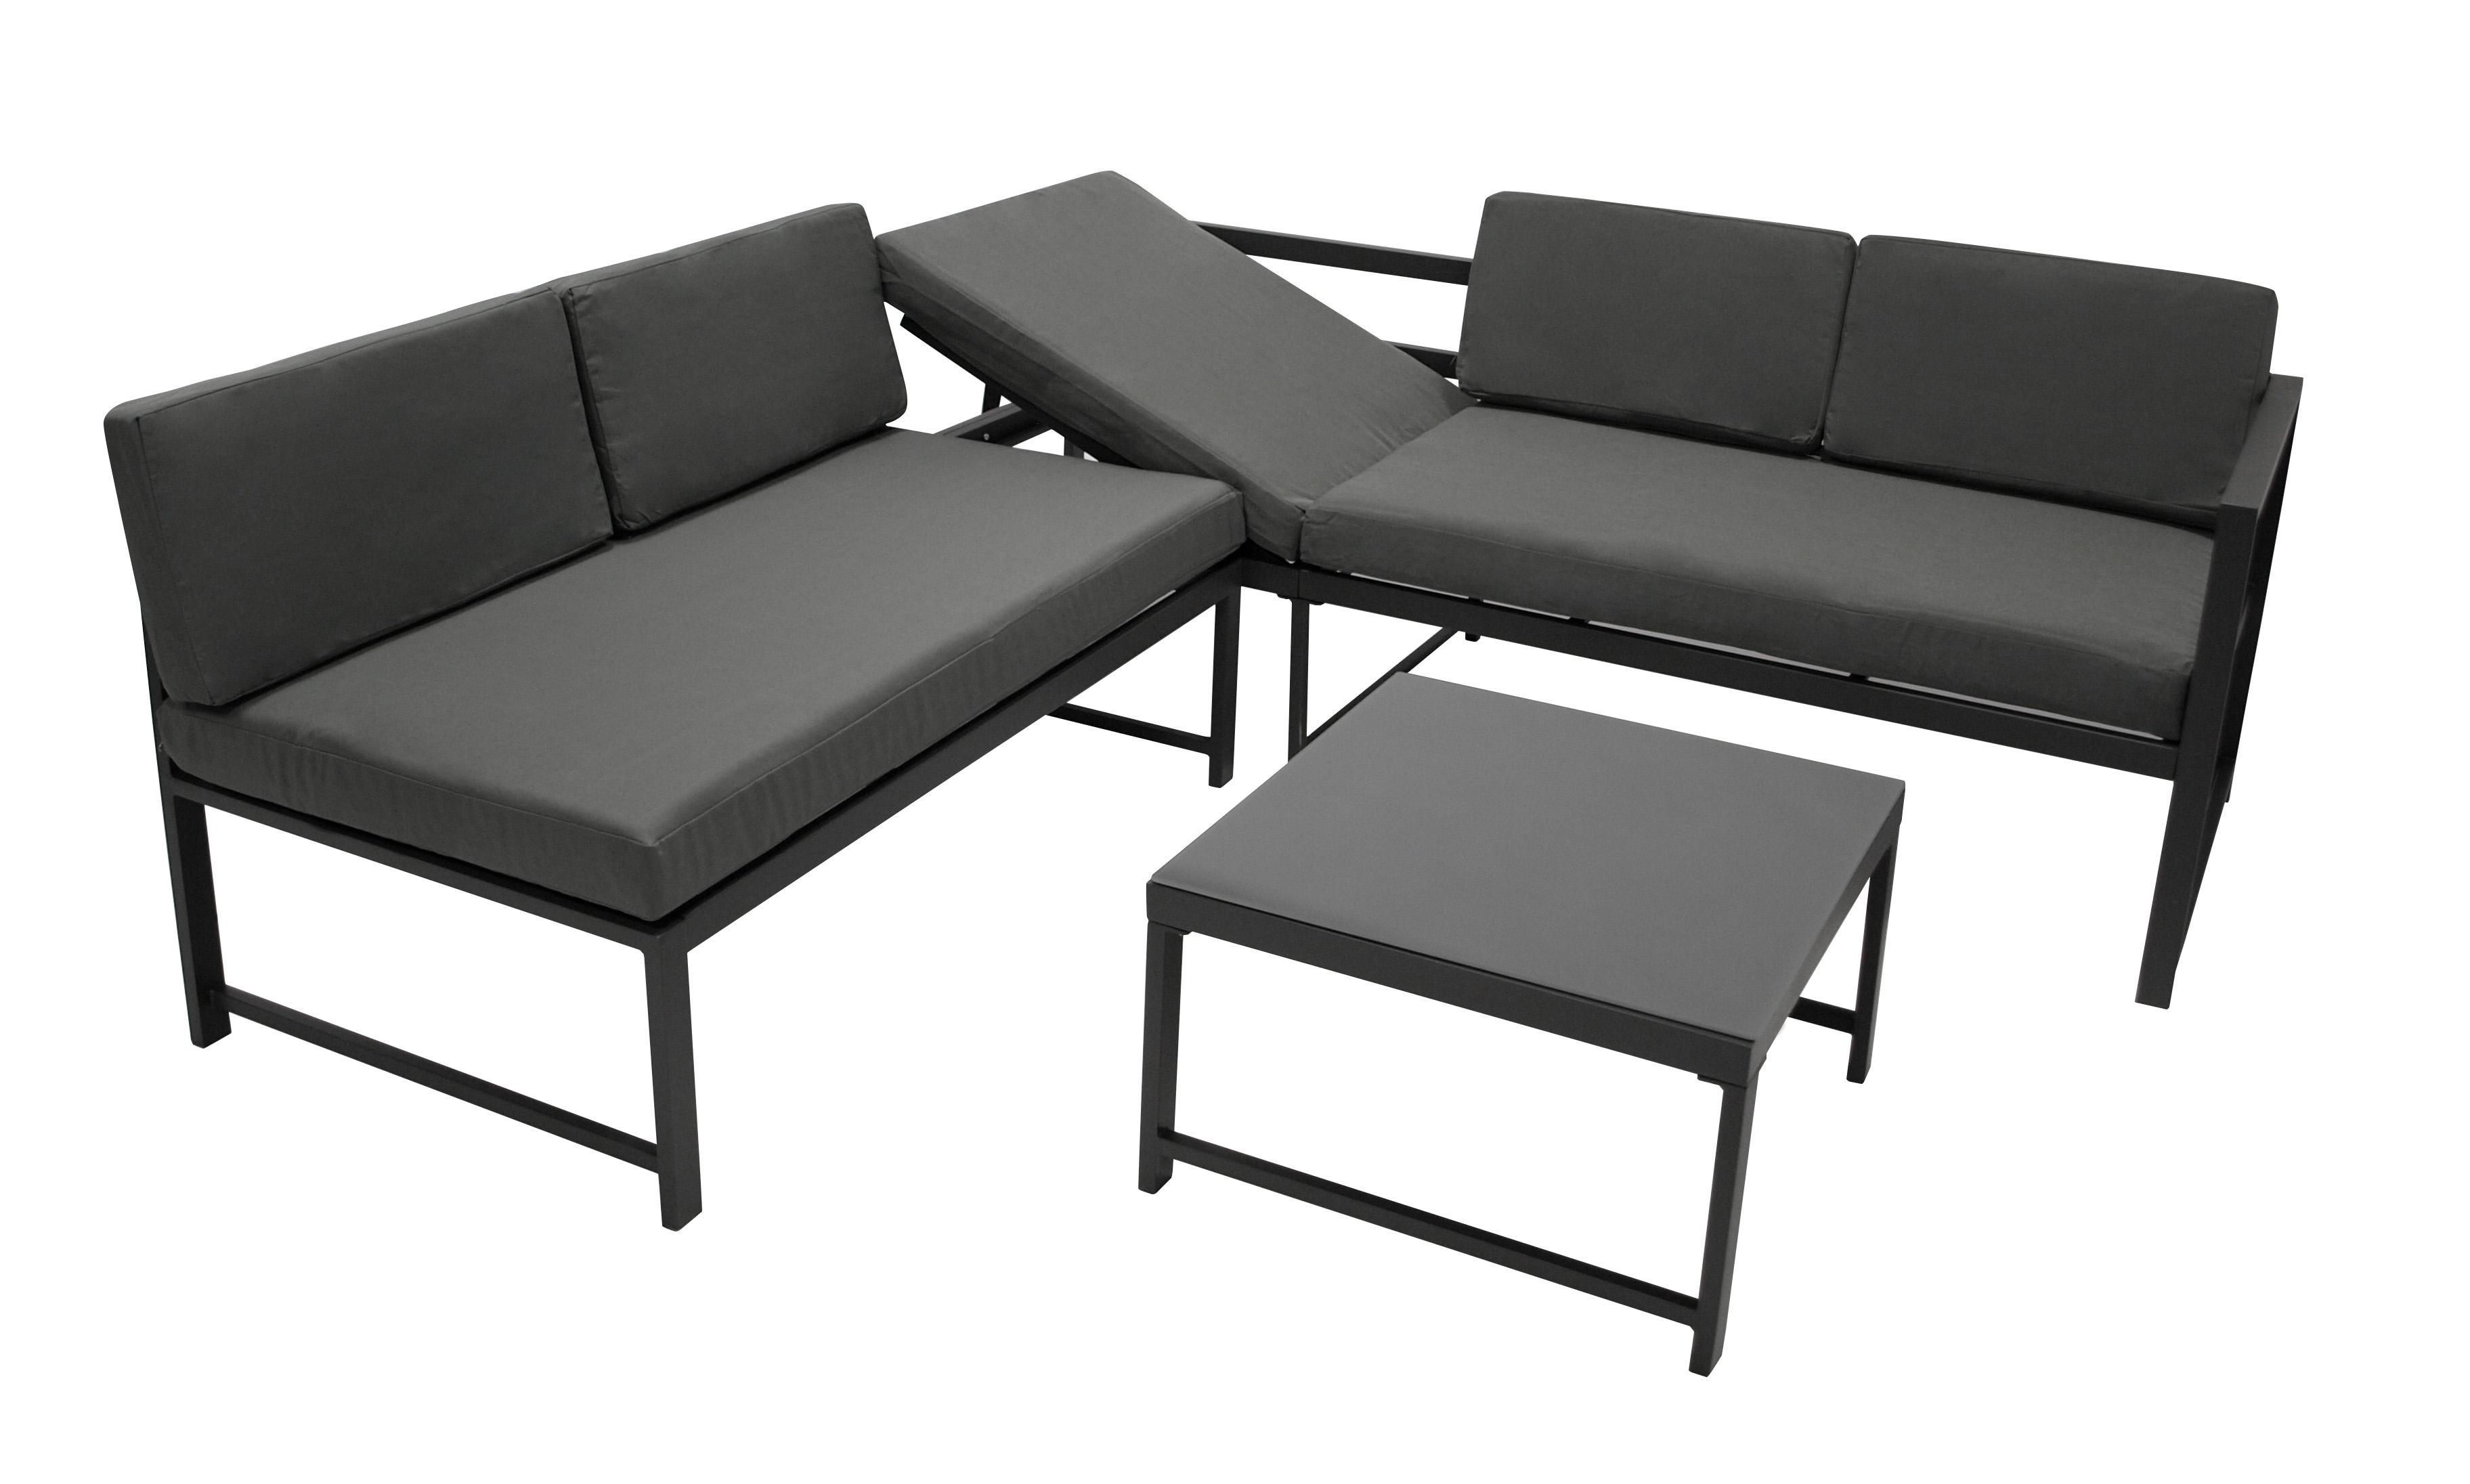 Funktions Lounge Set MONTANA, Metall dunkelgrau, Polster grau